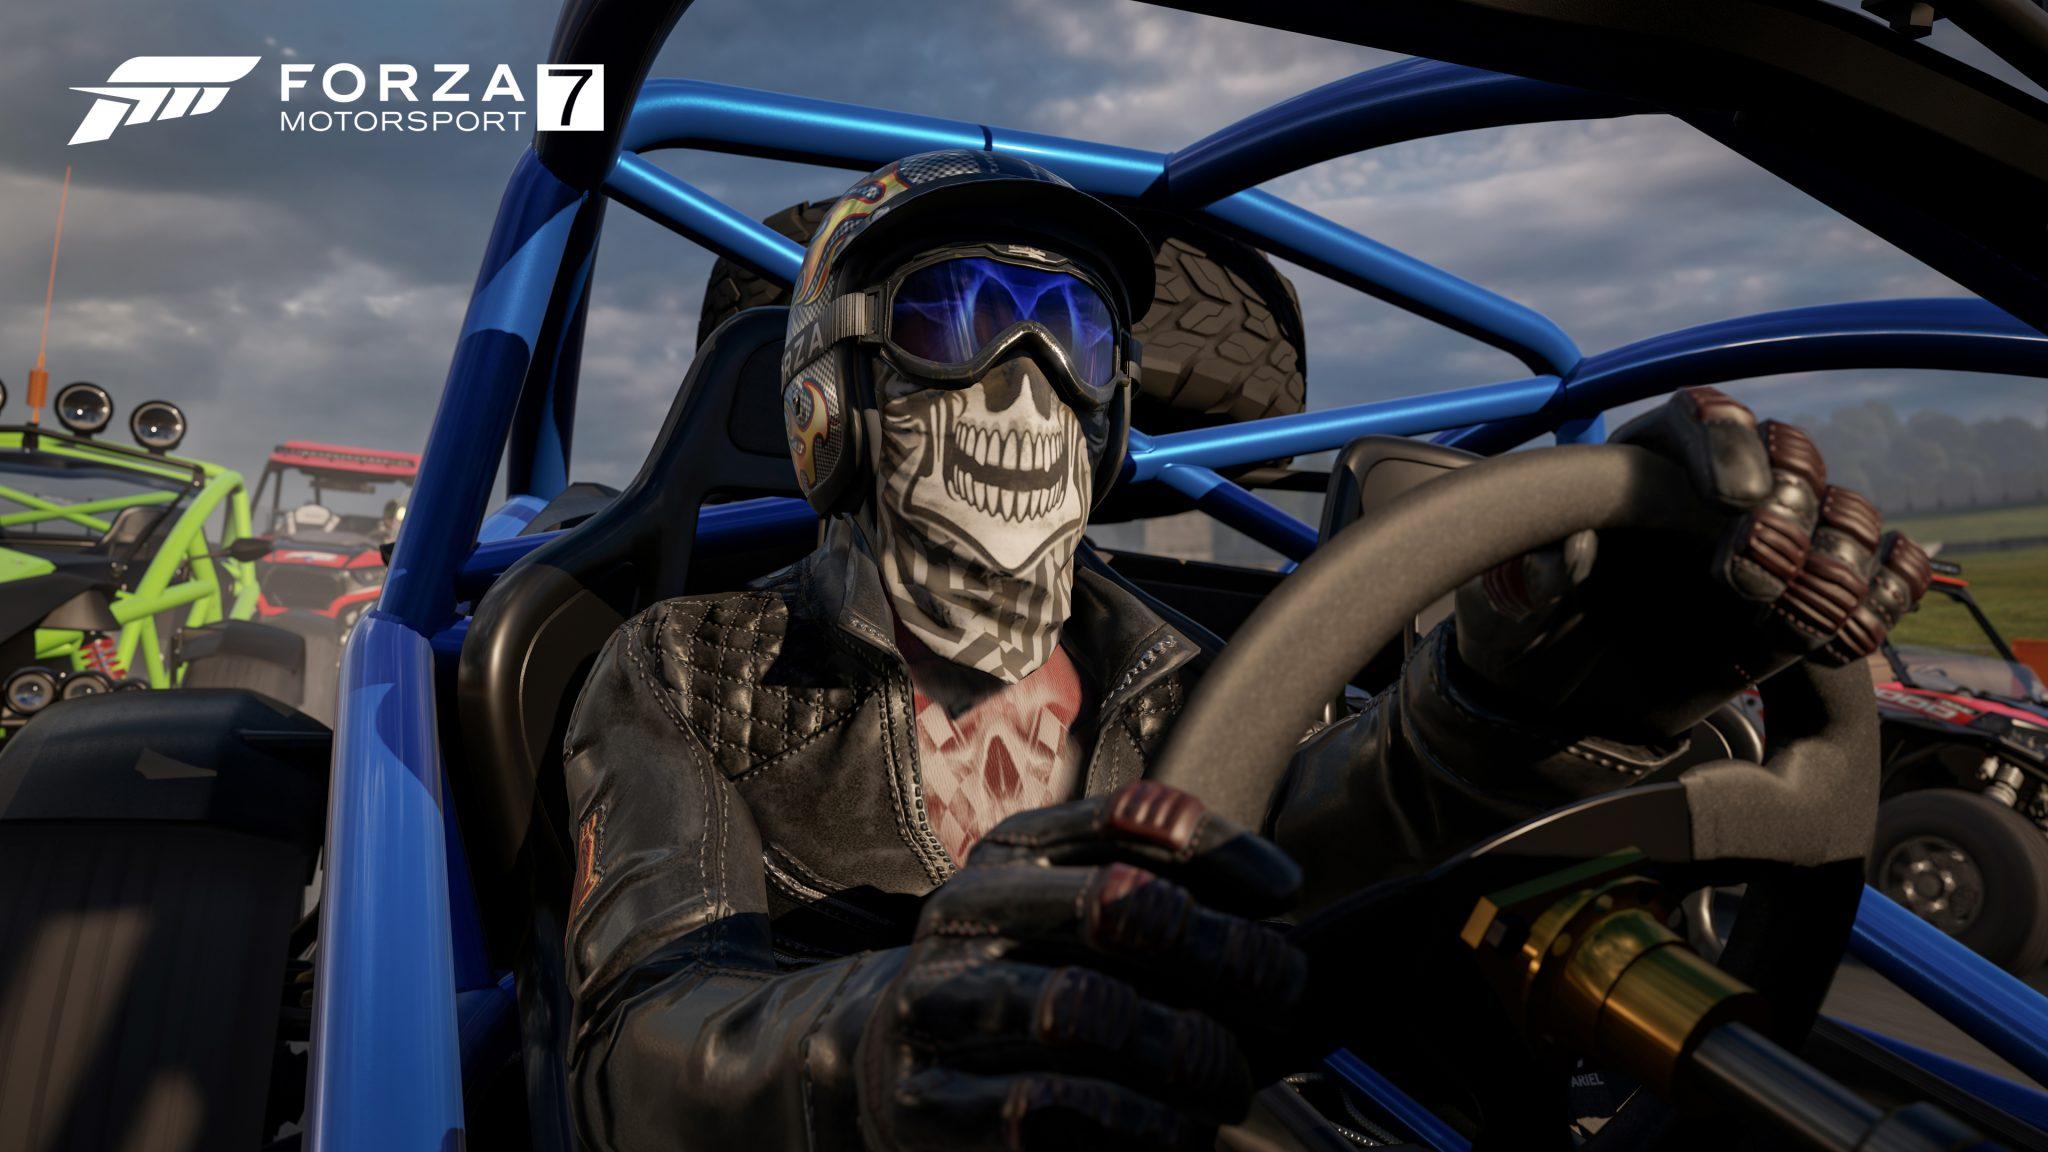 Forza Motorsport 7 Xbox One X PC Review Test 3